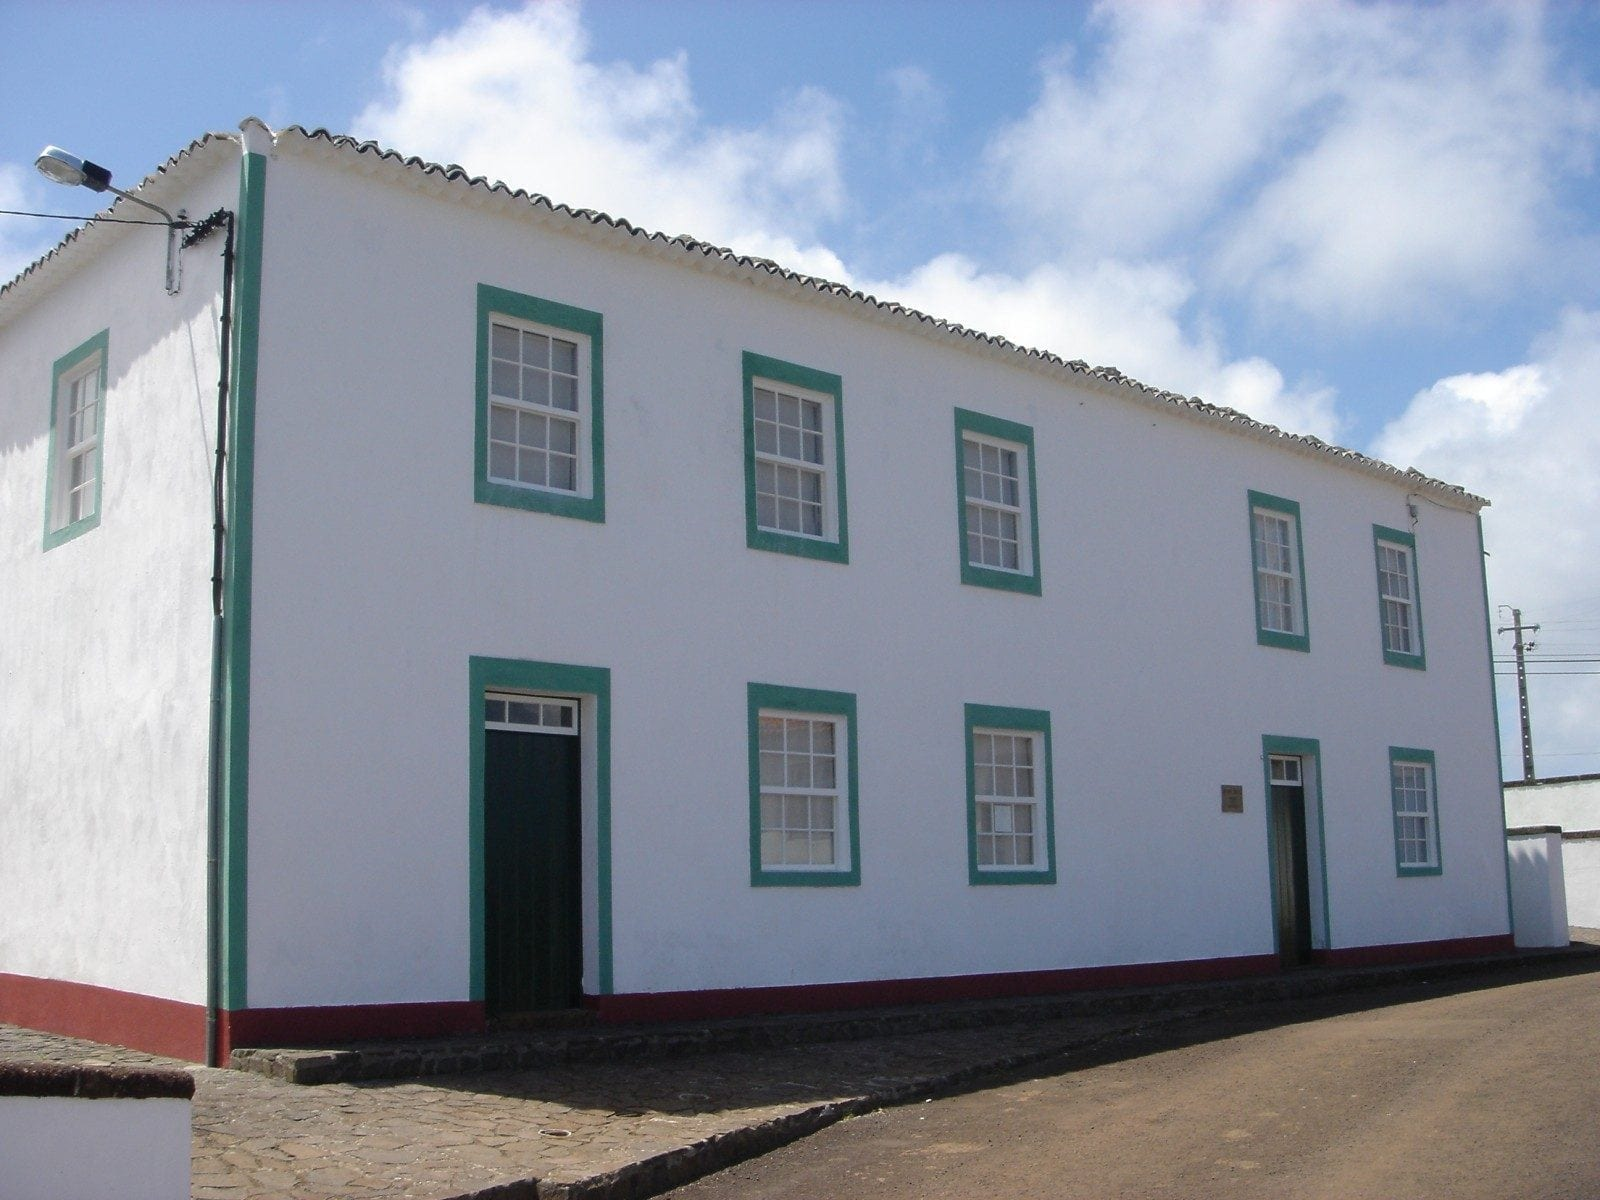 Museu de Santa Maria - Açores